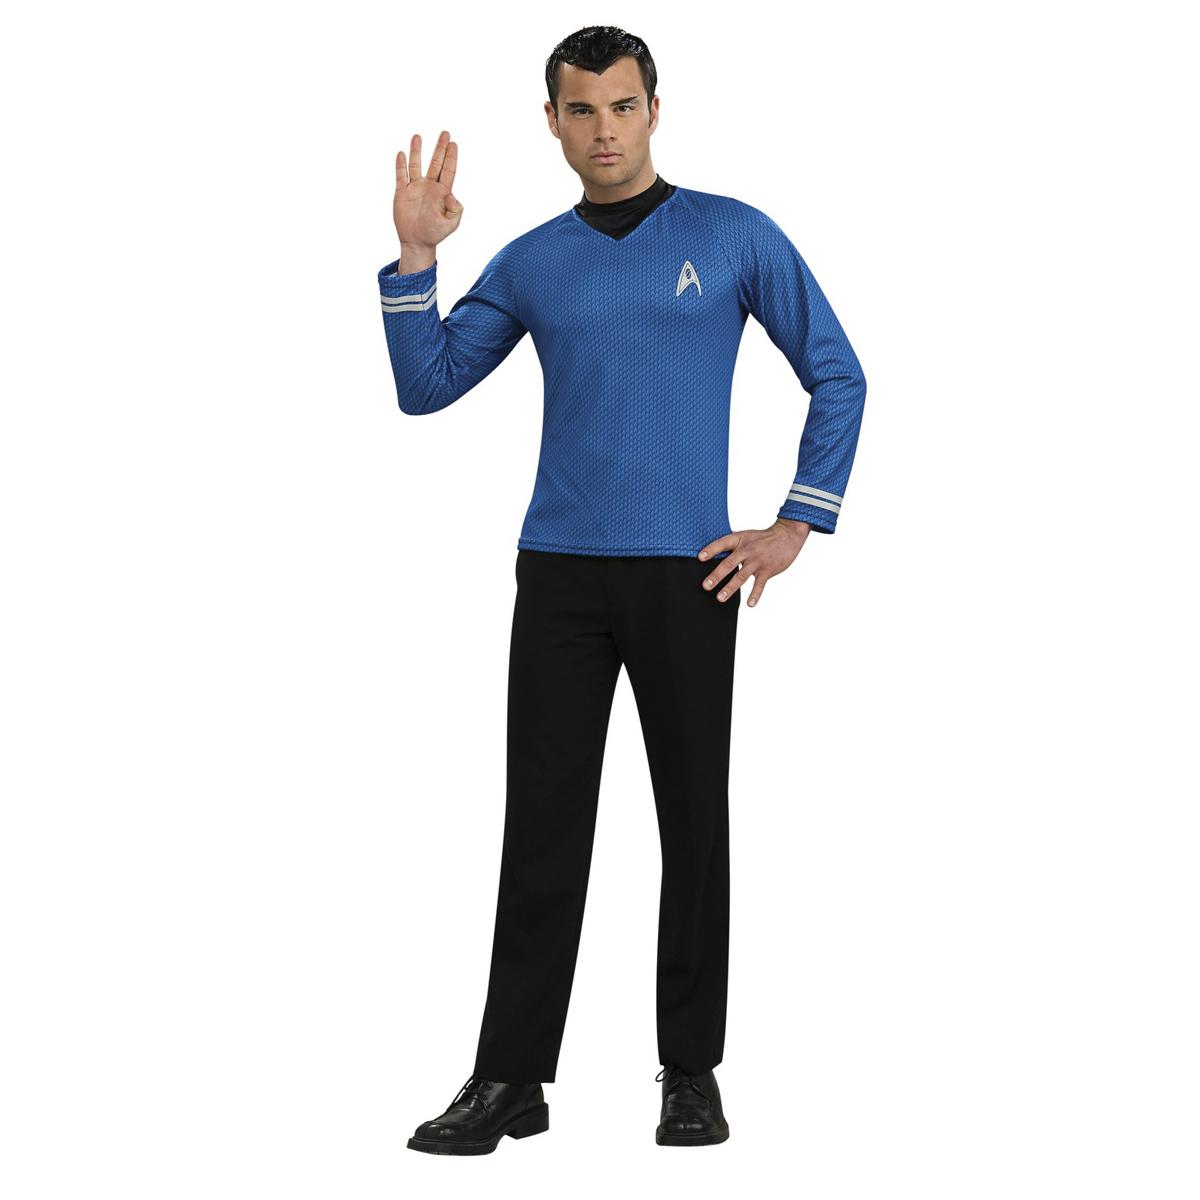 Star Trek Movie Spock Blue Shirt Adult Costume